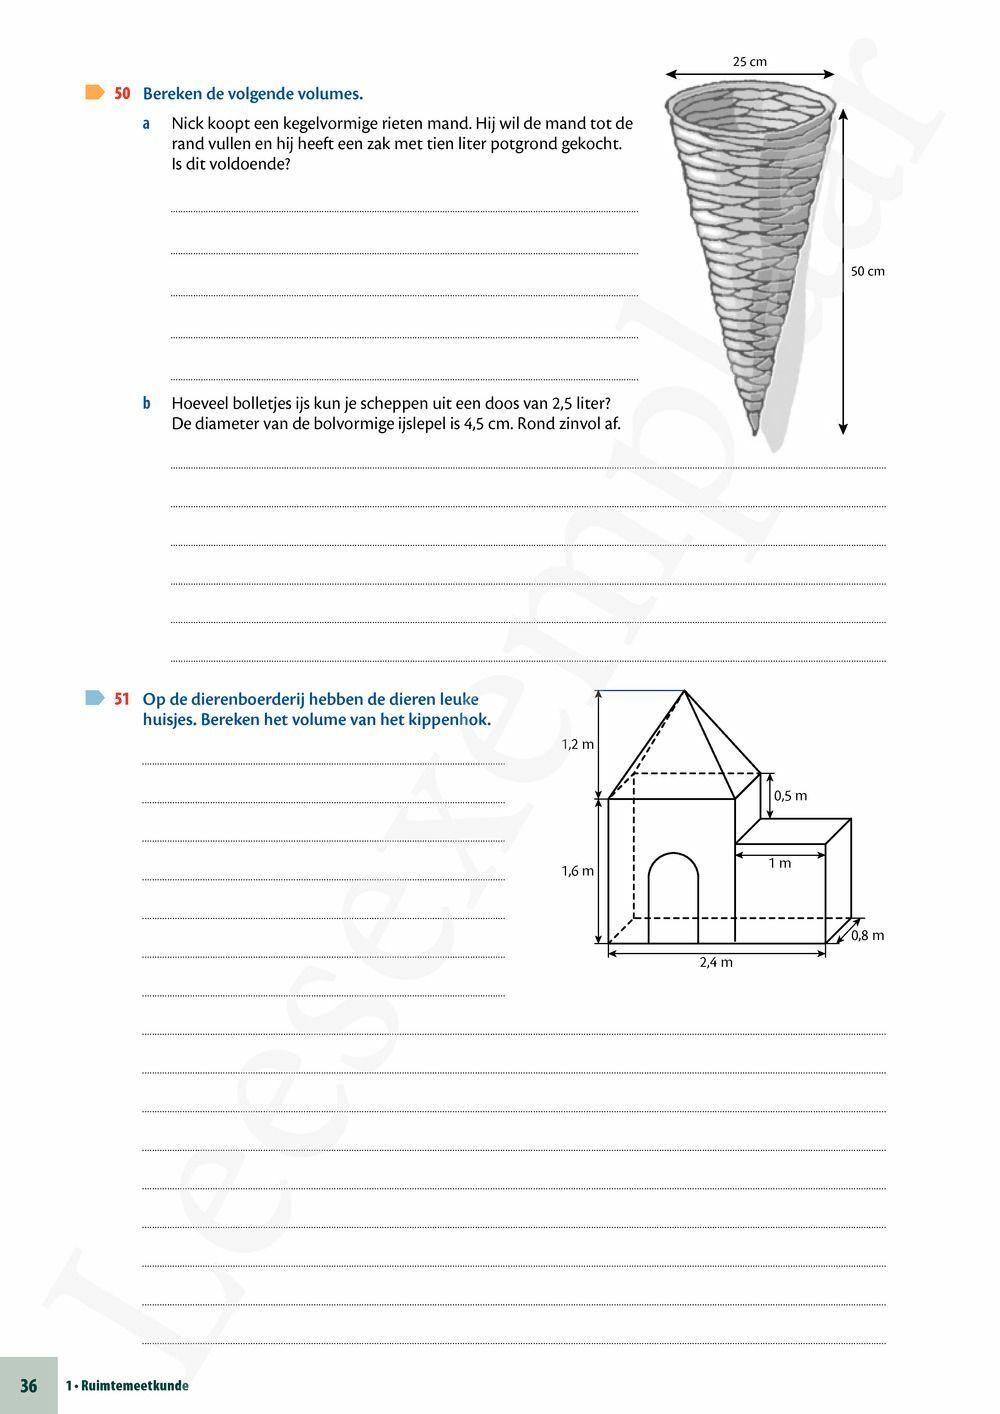 Preview: Matrix Wiskunde 2 Meetkunde Leerwerkboek (inclusief Pelckmans Portaal)